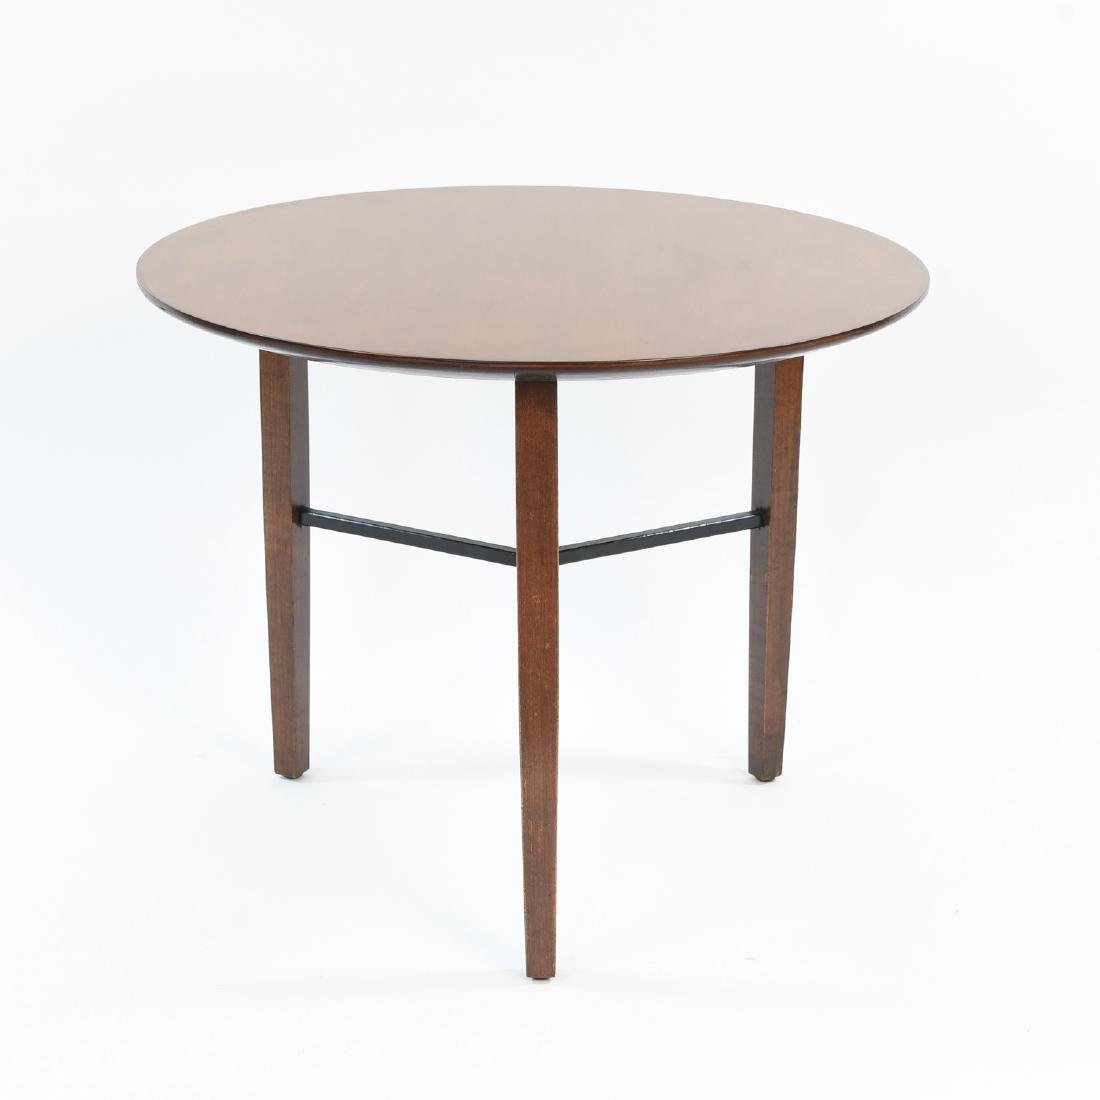 LEWIS BUTLER FOR KNOLL 3 LEG SIDE TABLE